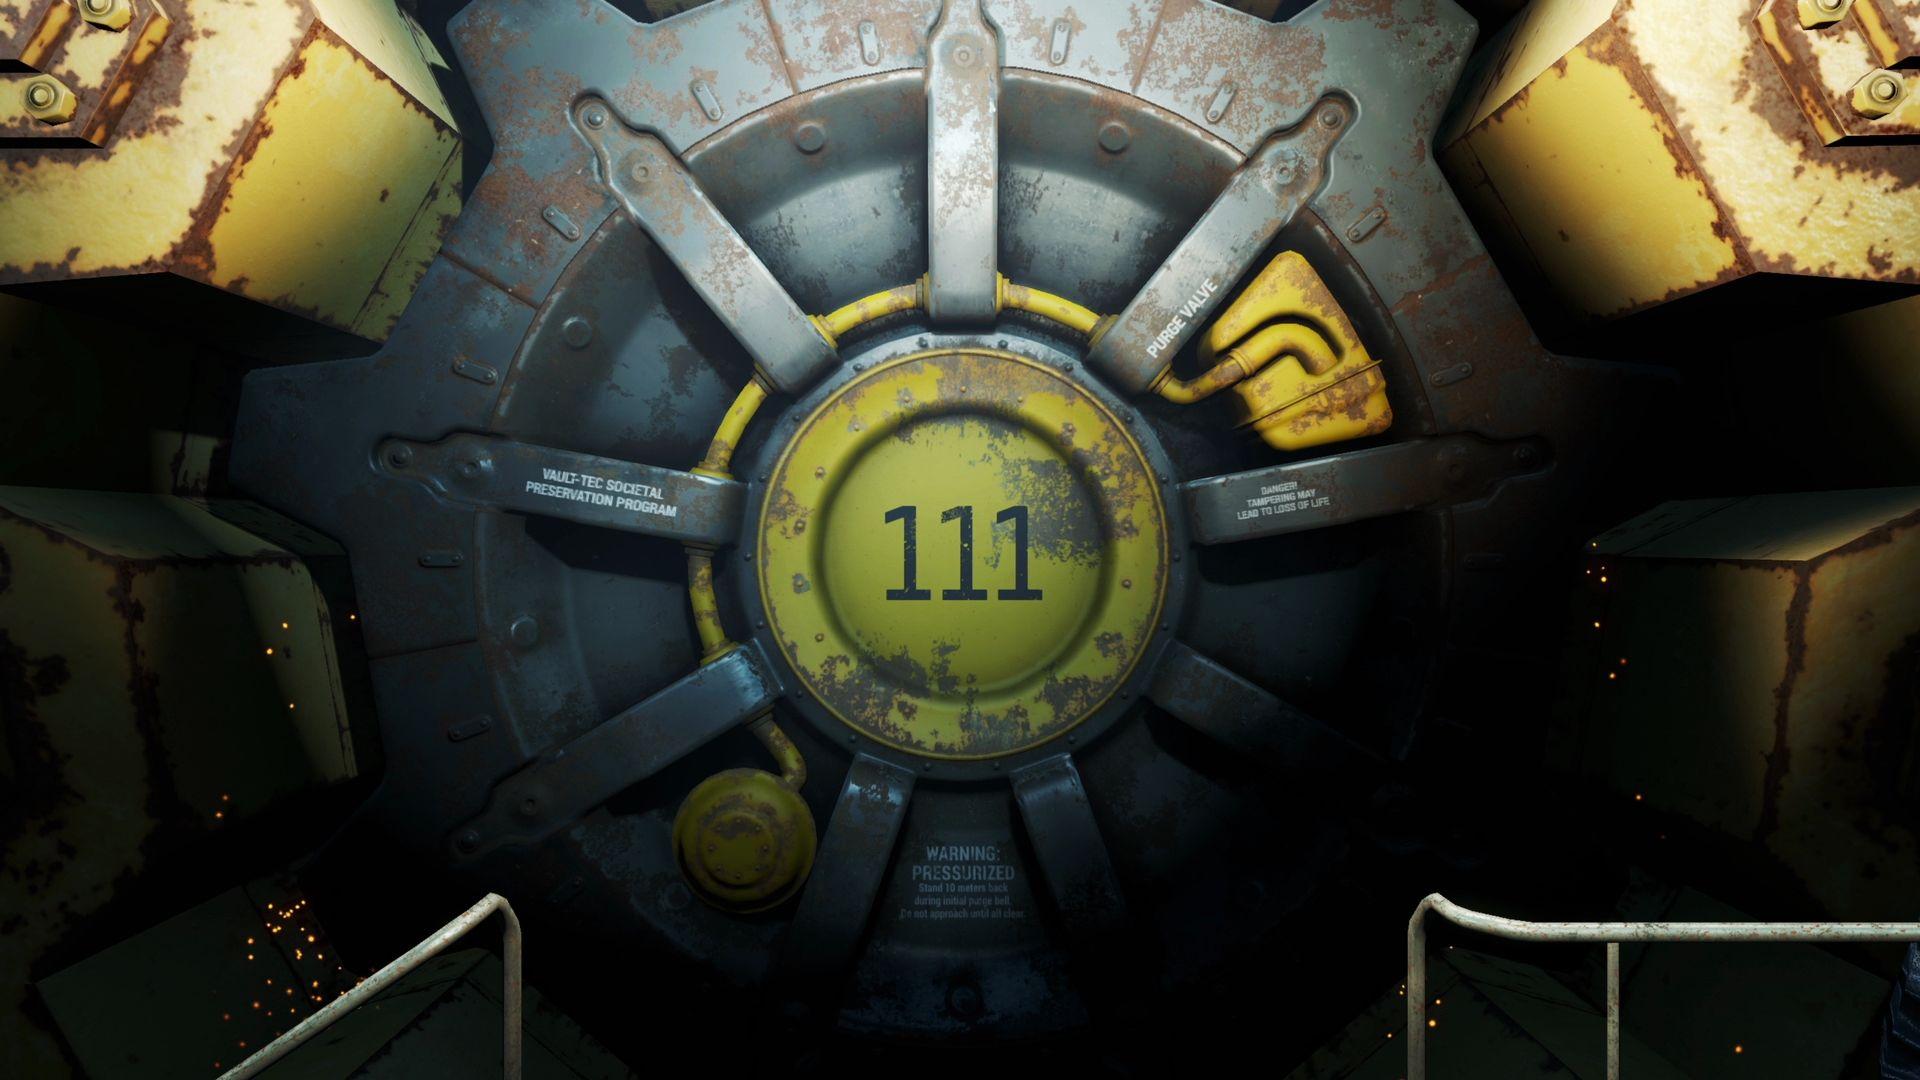 Fallout 4 Wallpaper Animereaperclub 2015 12